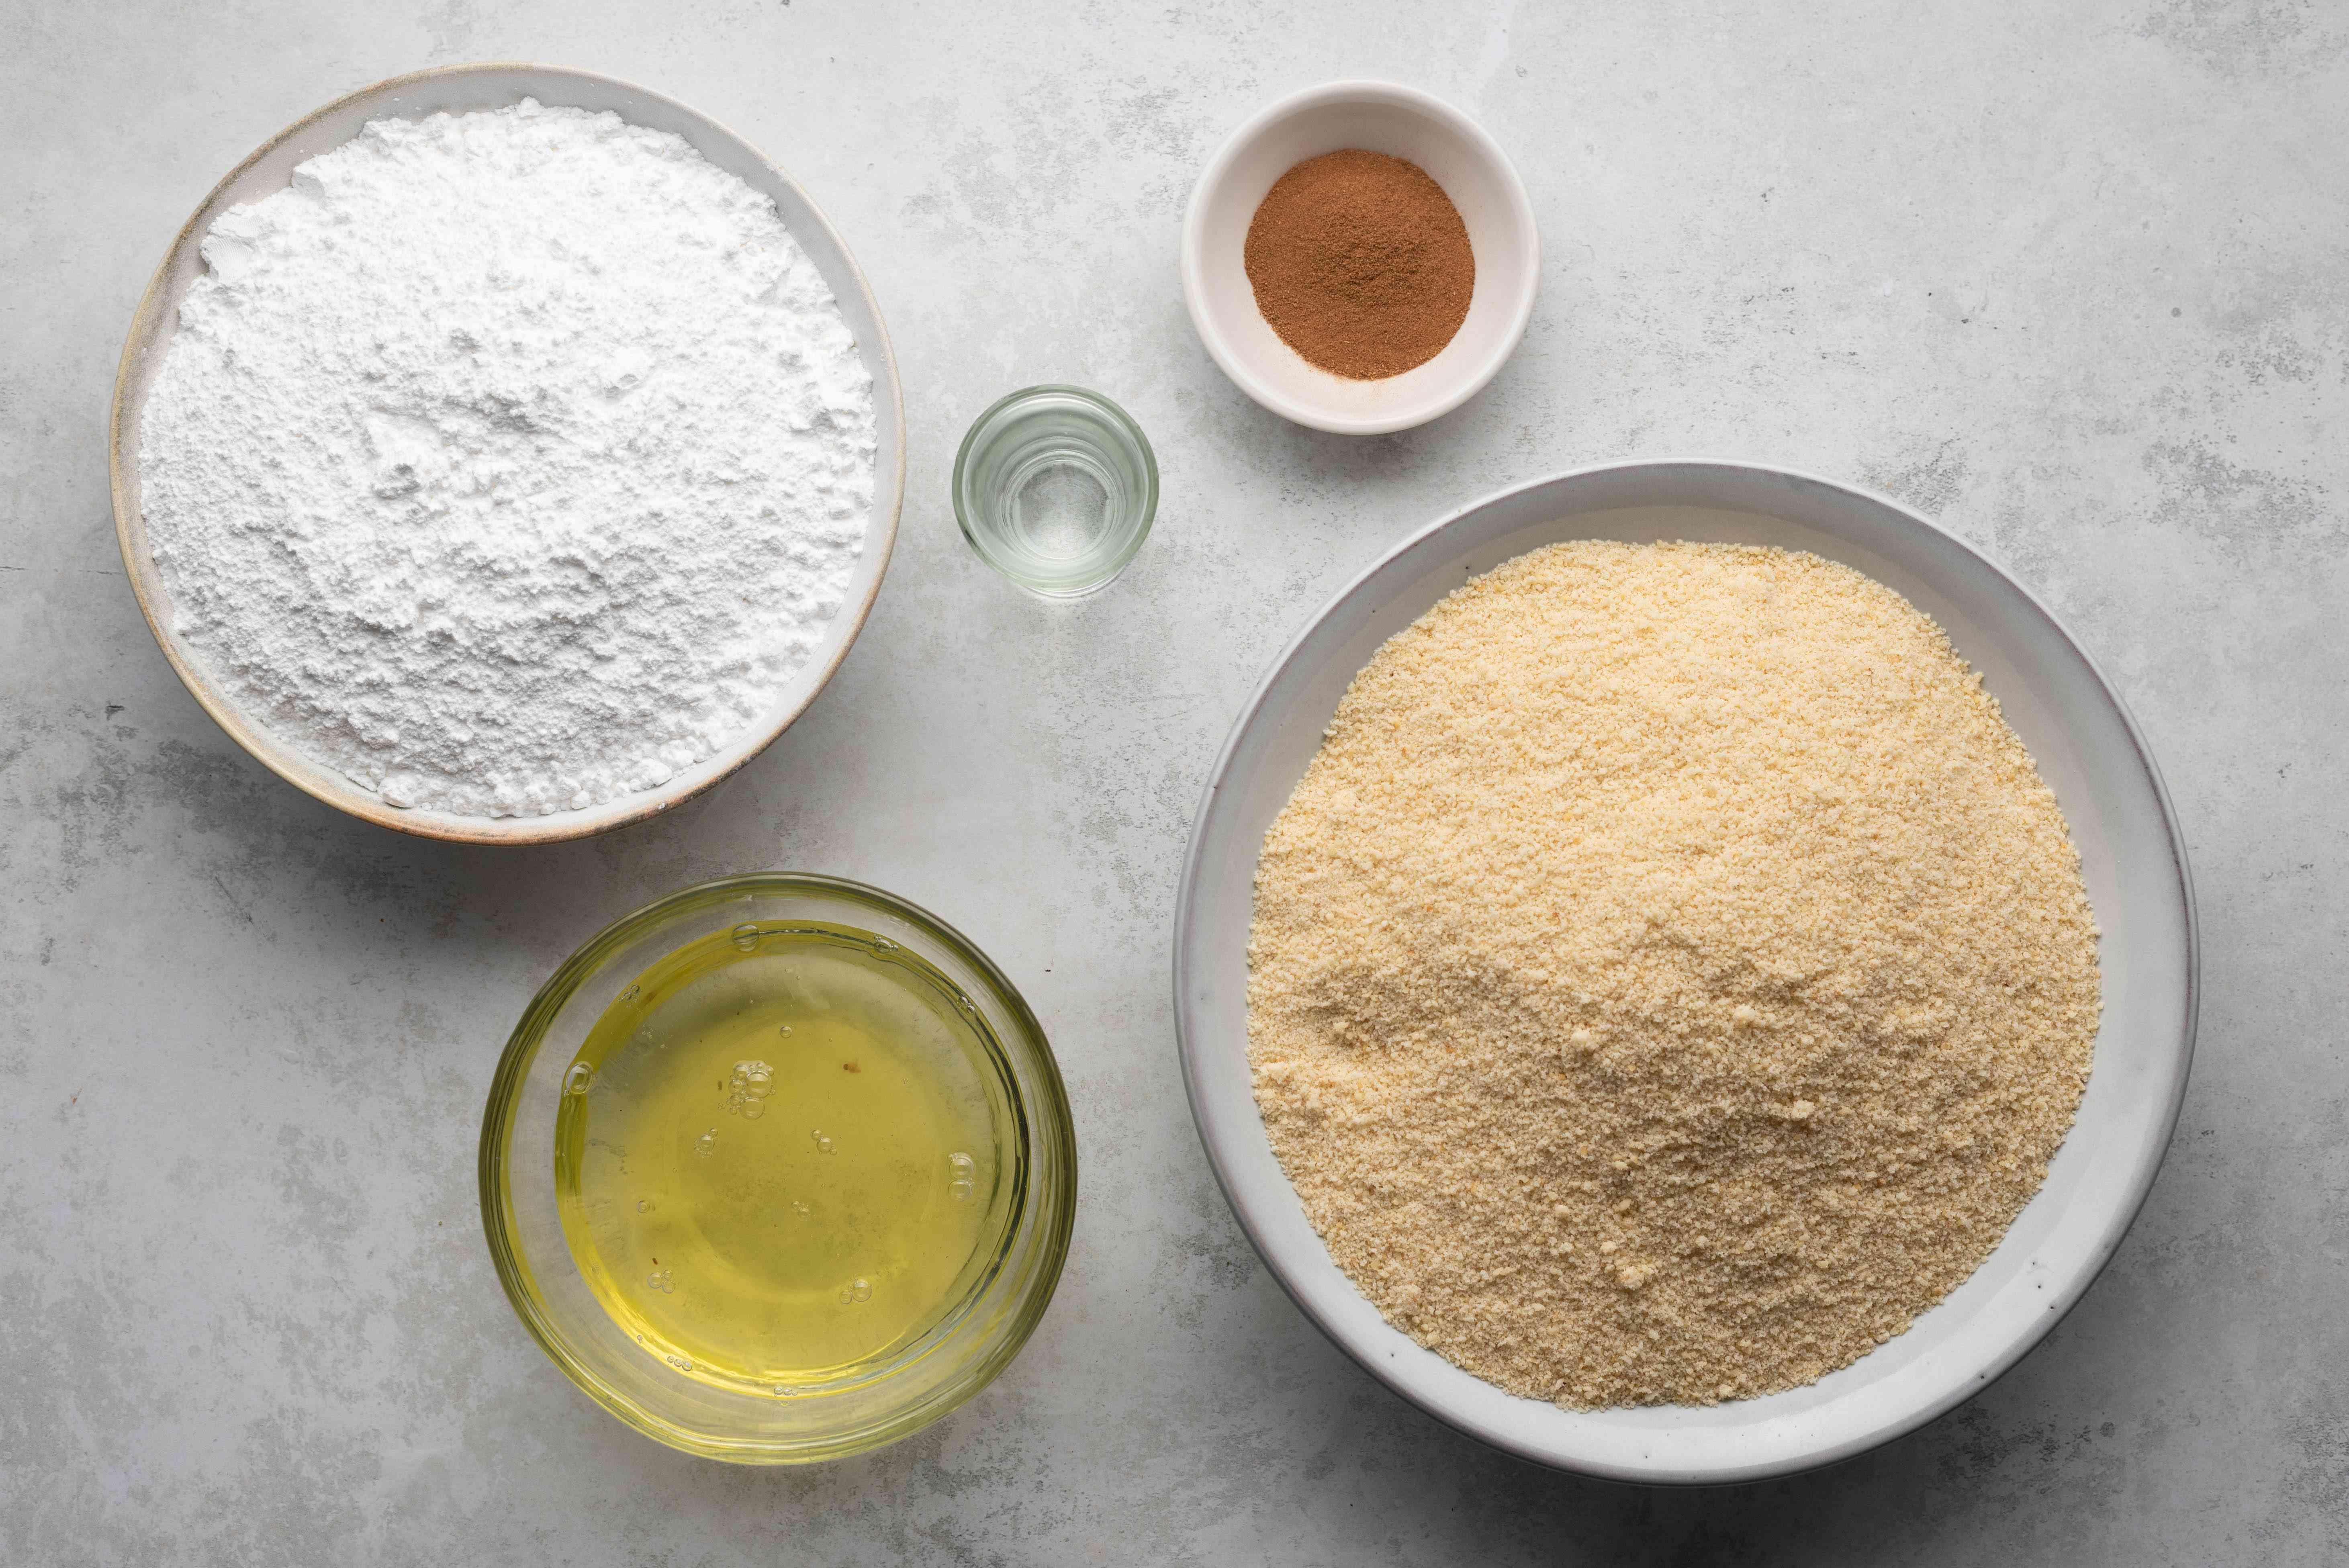 Ingredients for German zimsterne